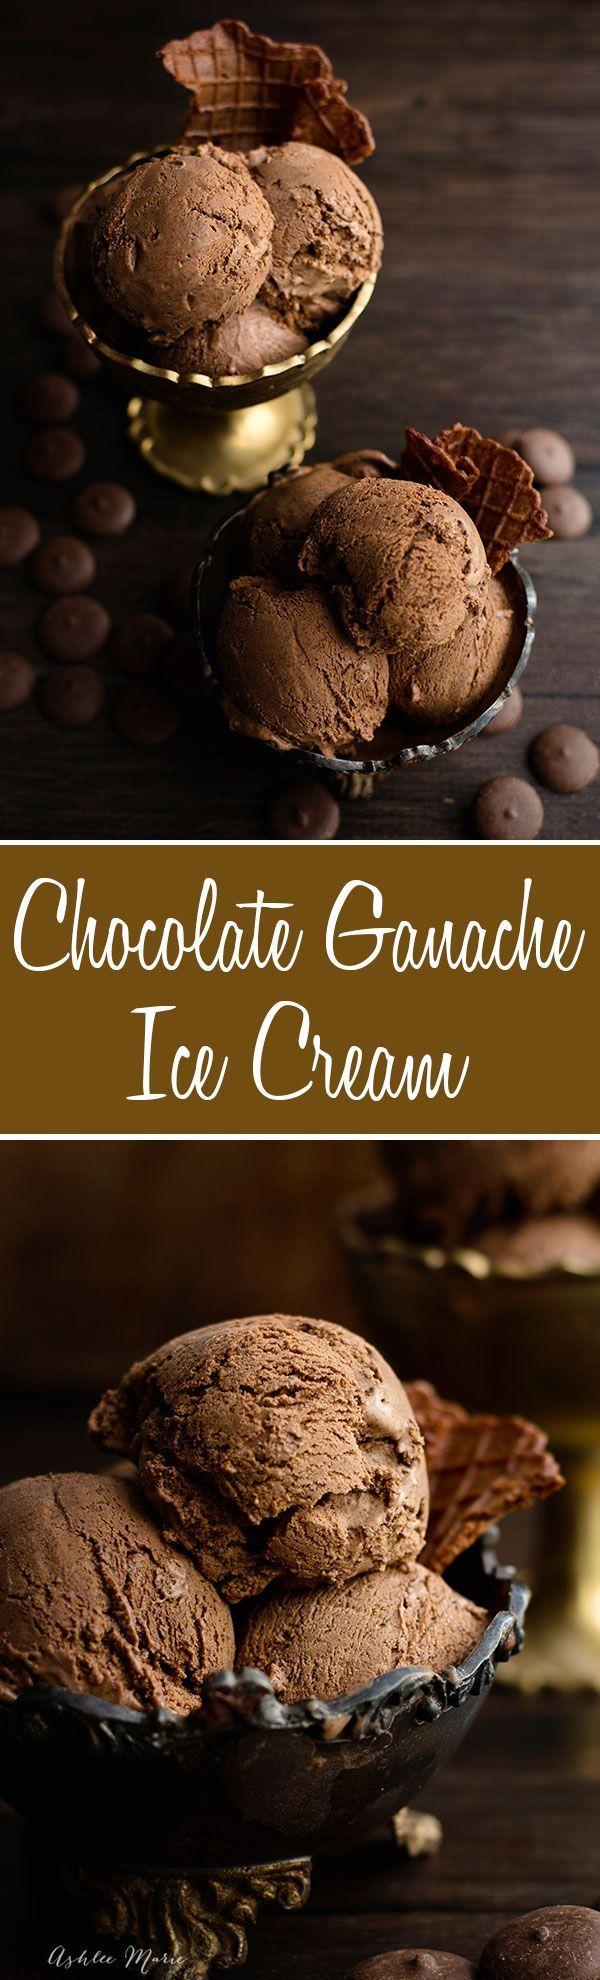 dark chocolate ganache ice cream is the most decadent, rich bite of chocolate ice cream you will ever enjoy